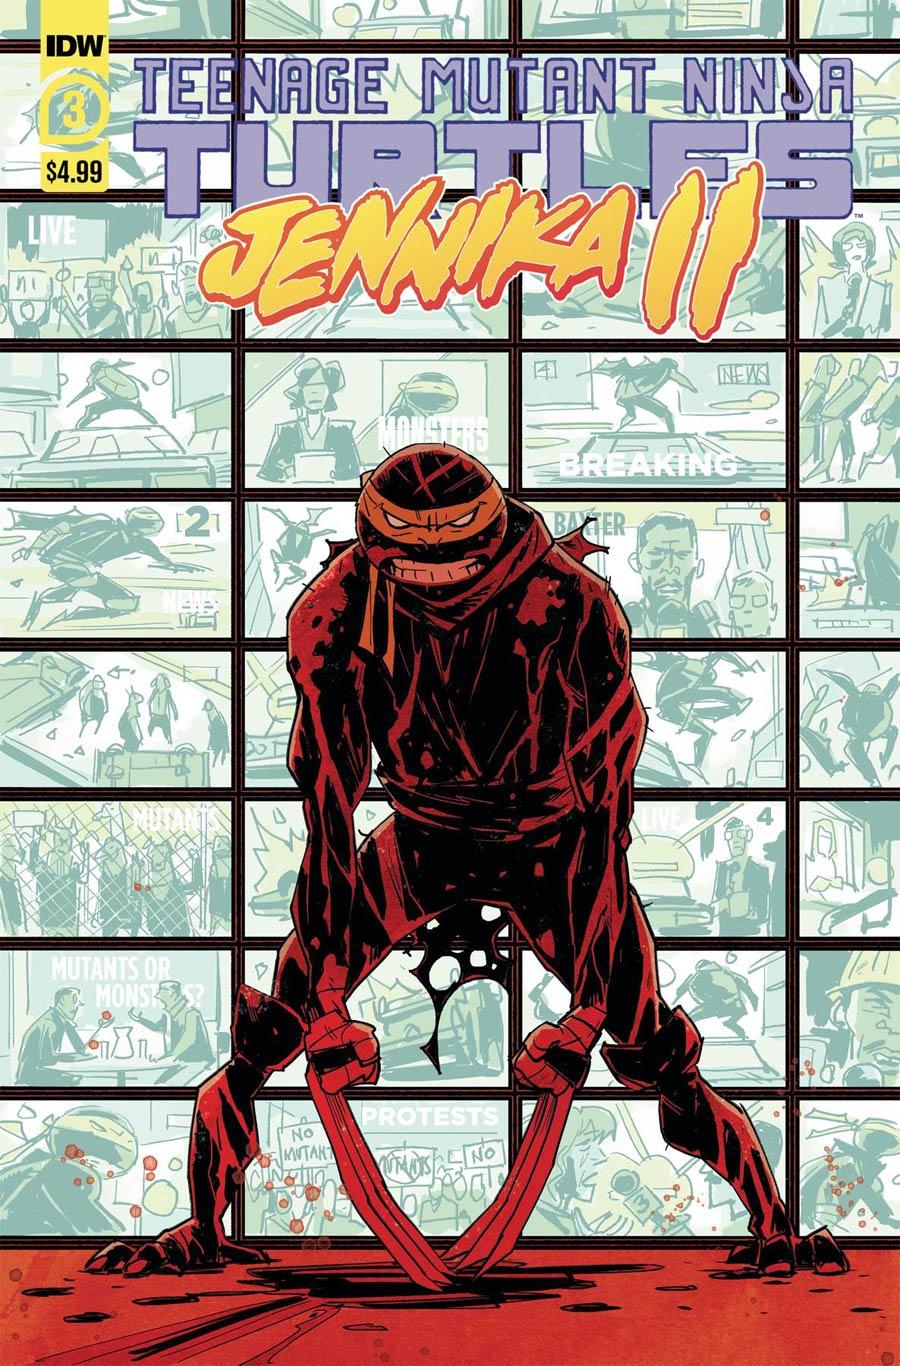 Teenage Mutant Ninja Turtles Jennika II #3 Cover A Regular Brahm Revel Cover